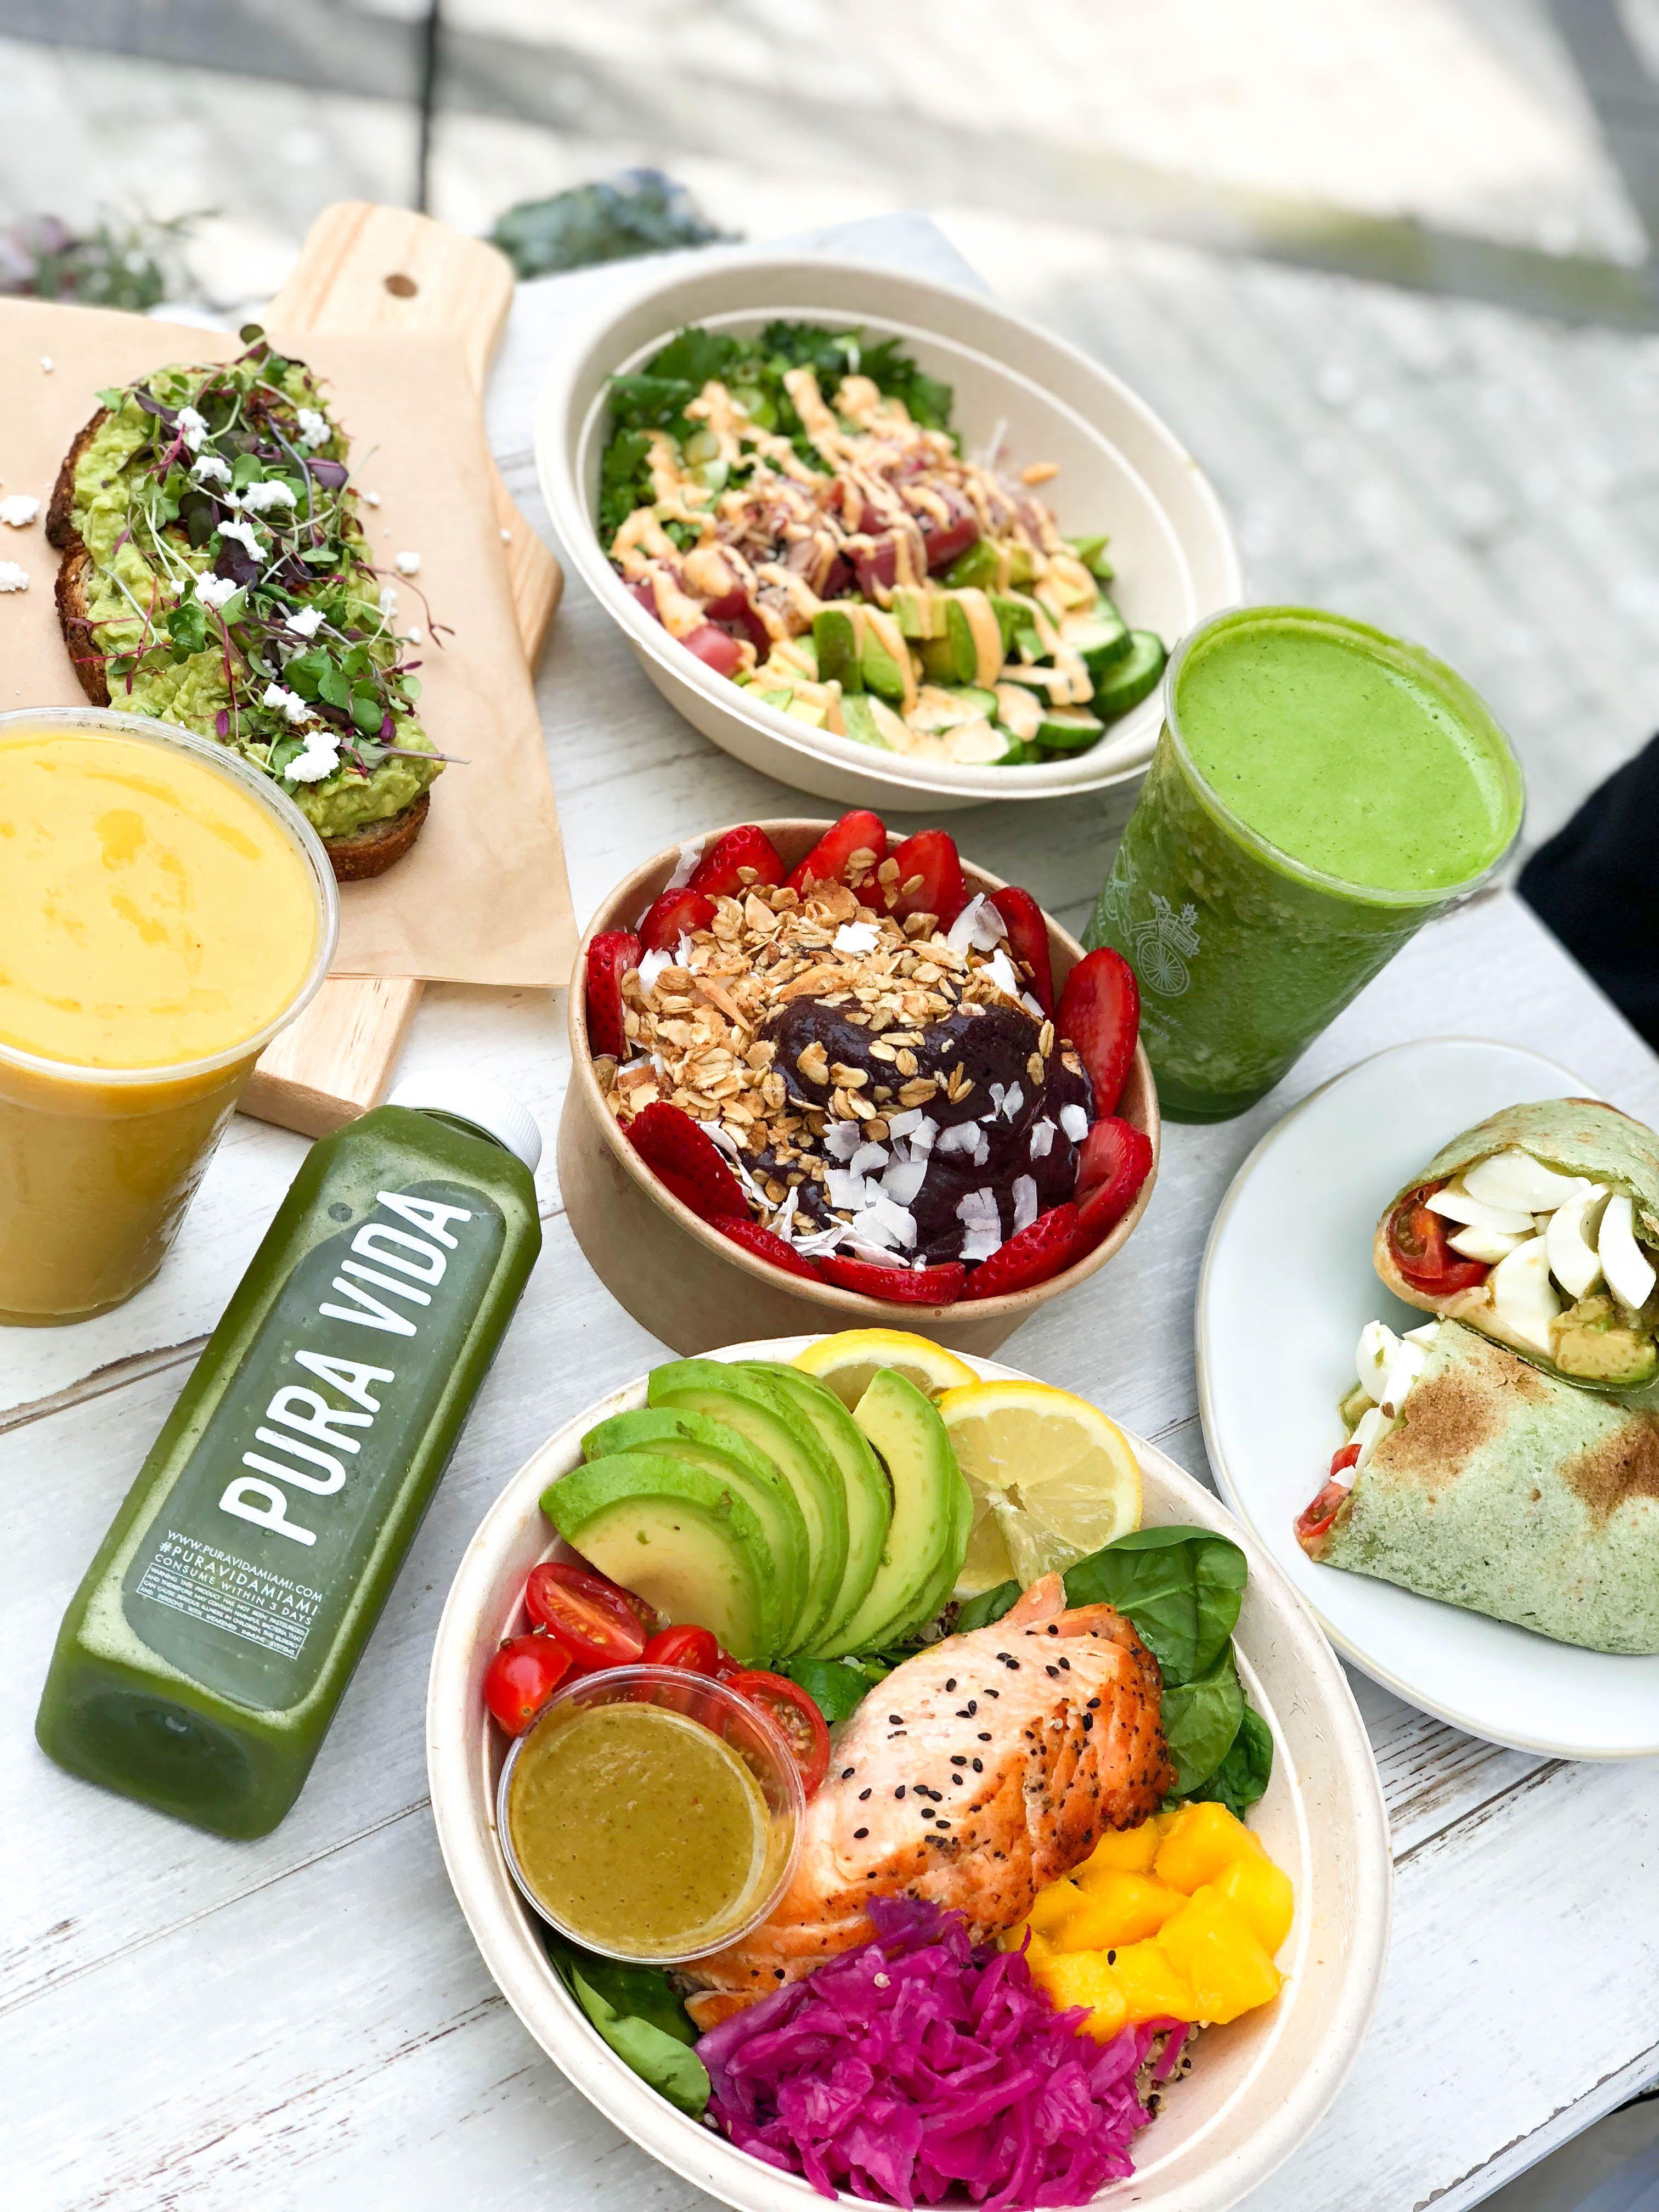 Healthy dishes all day long at Pura Vida Miami. Stop by